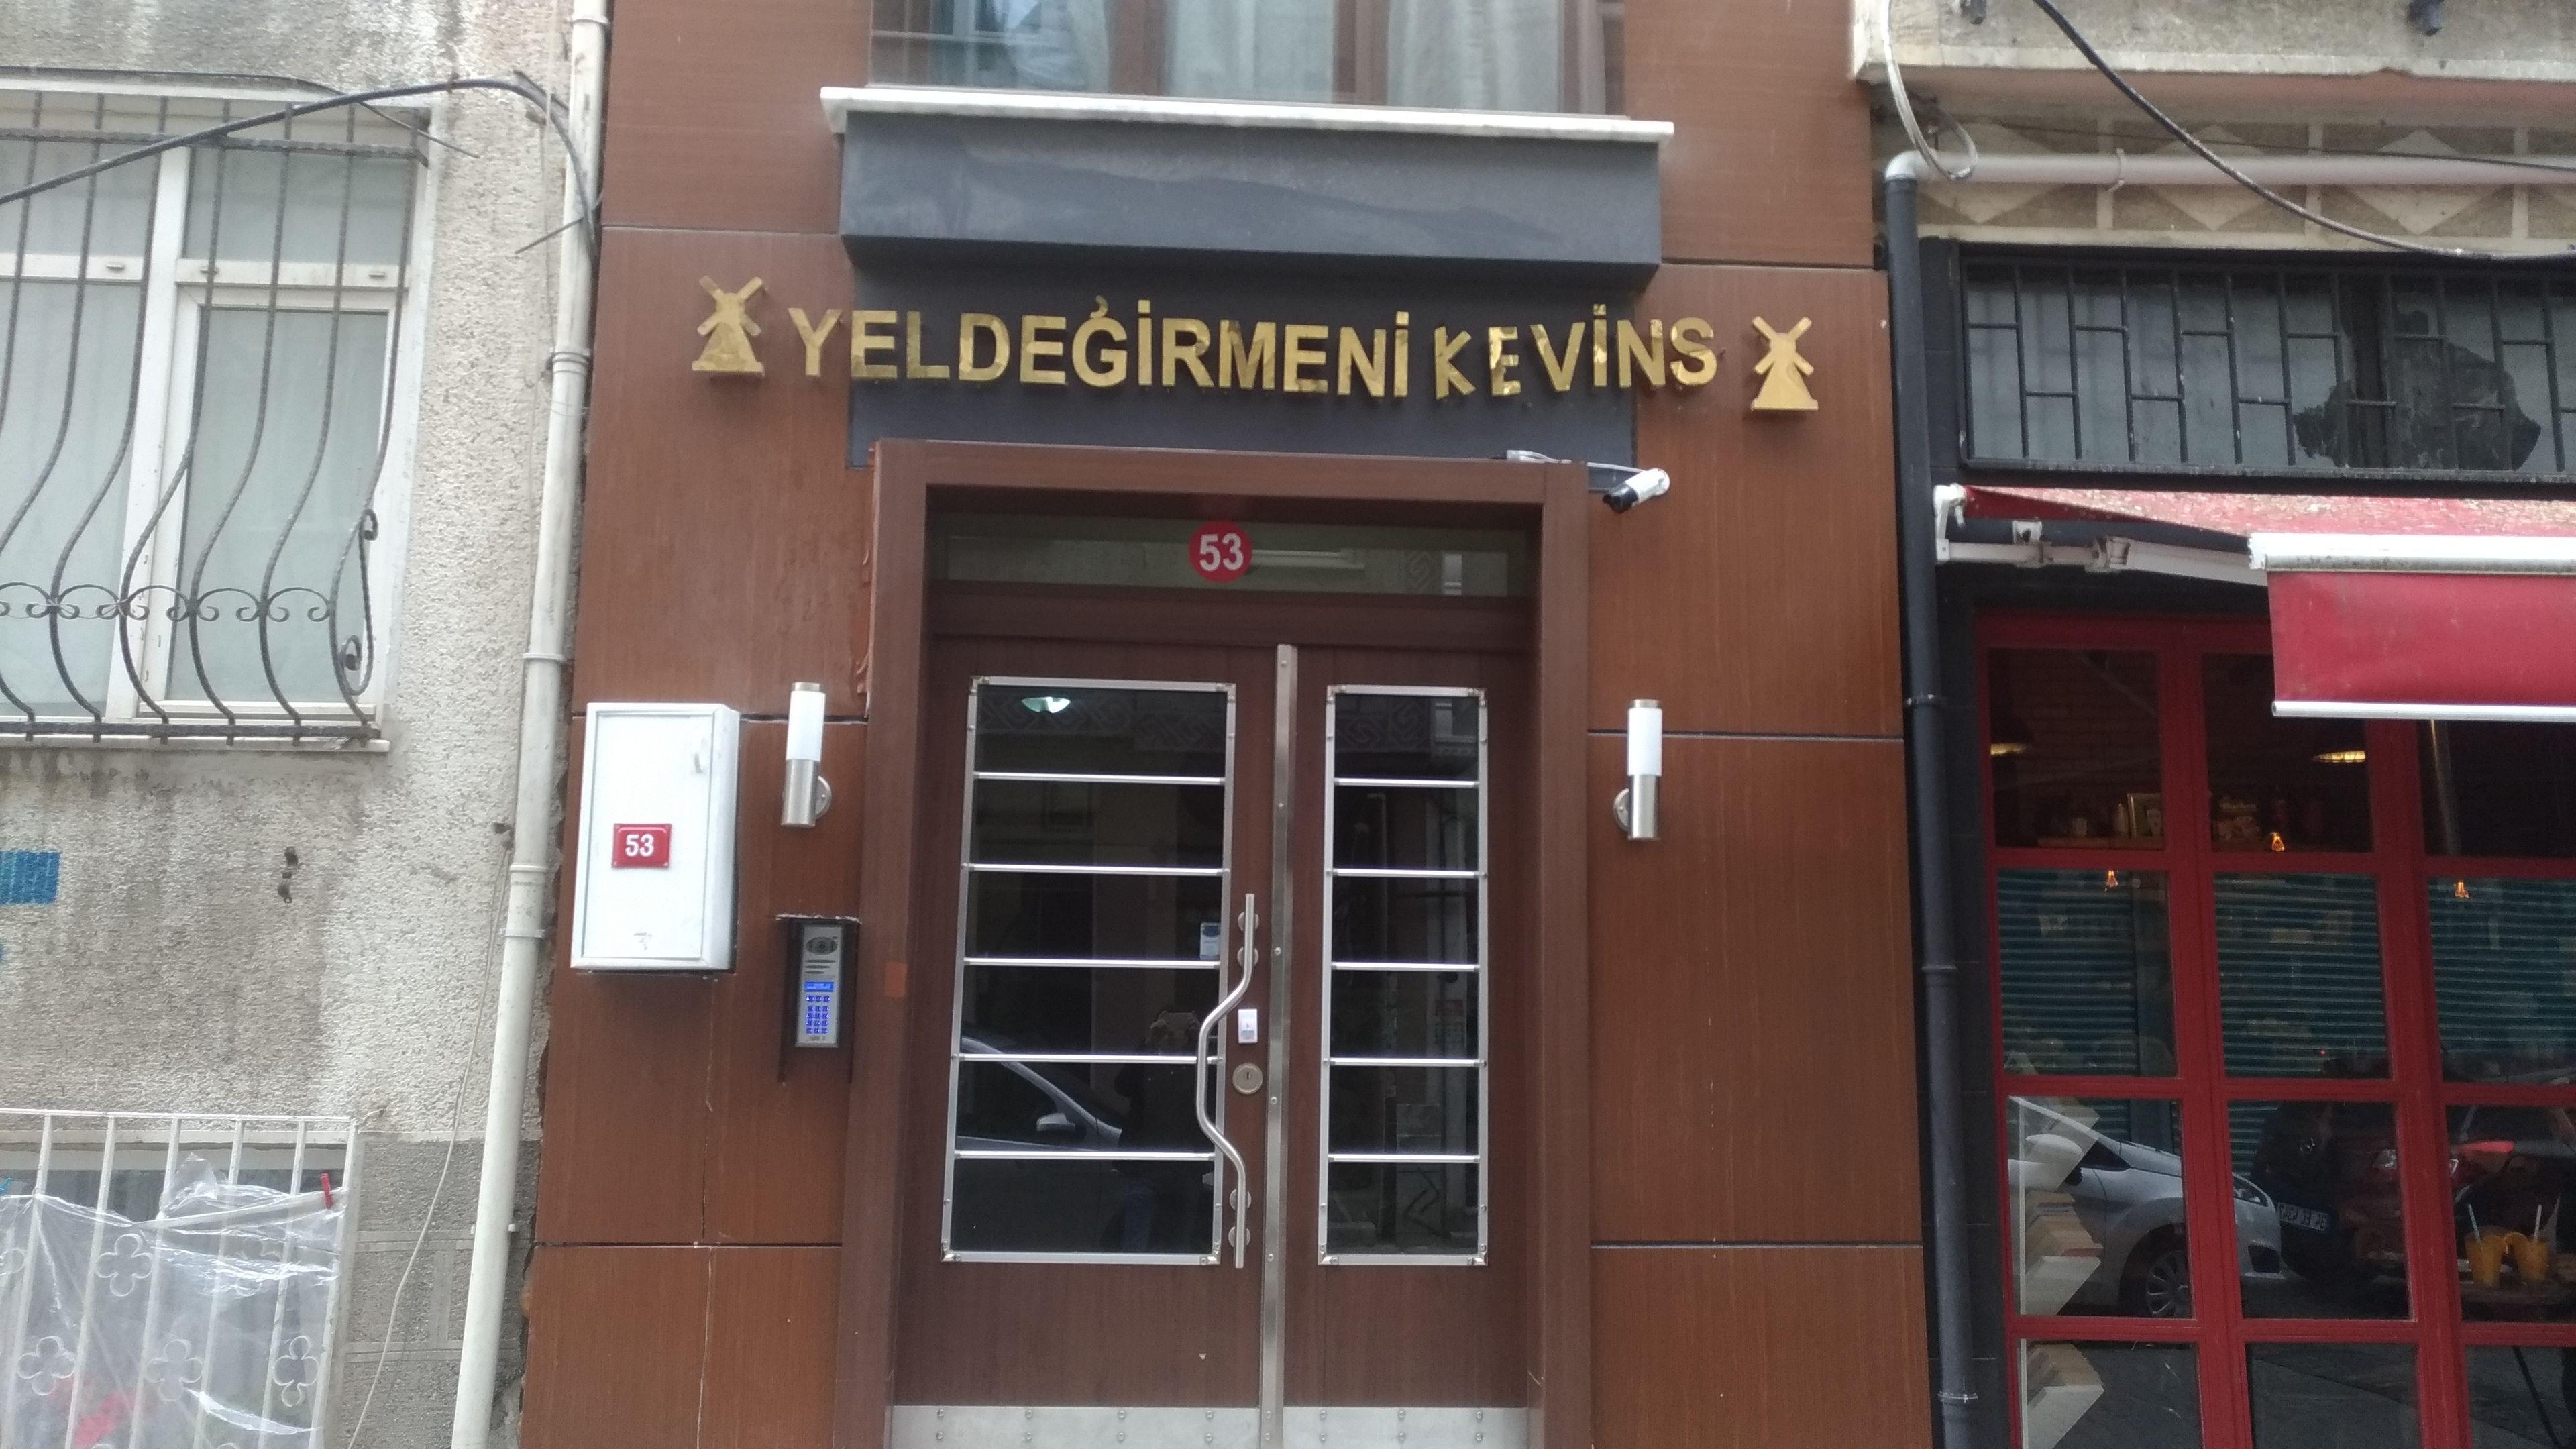 Kevins Hostel Yeldegirmeni